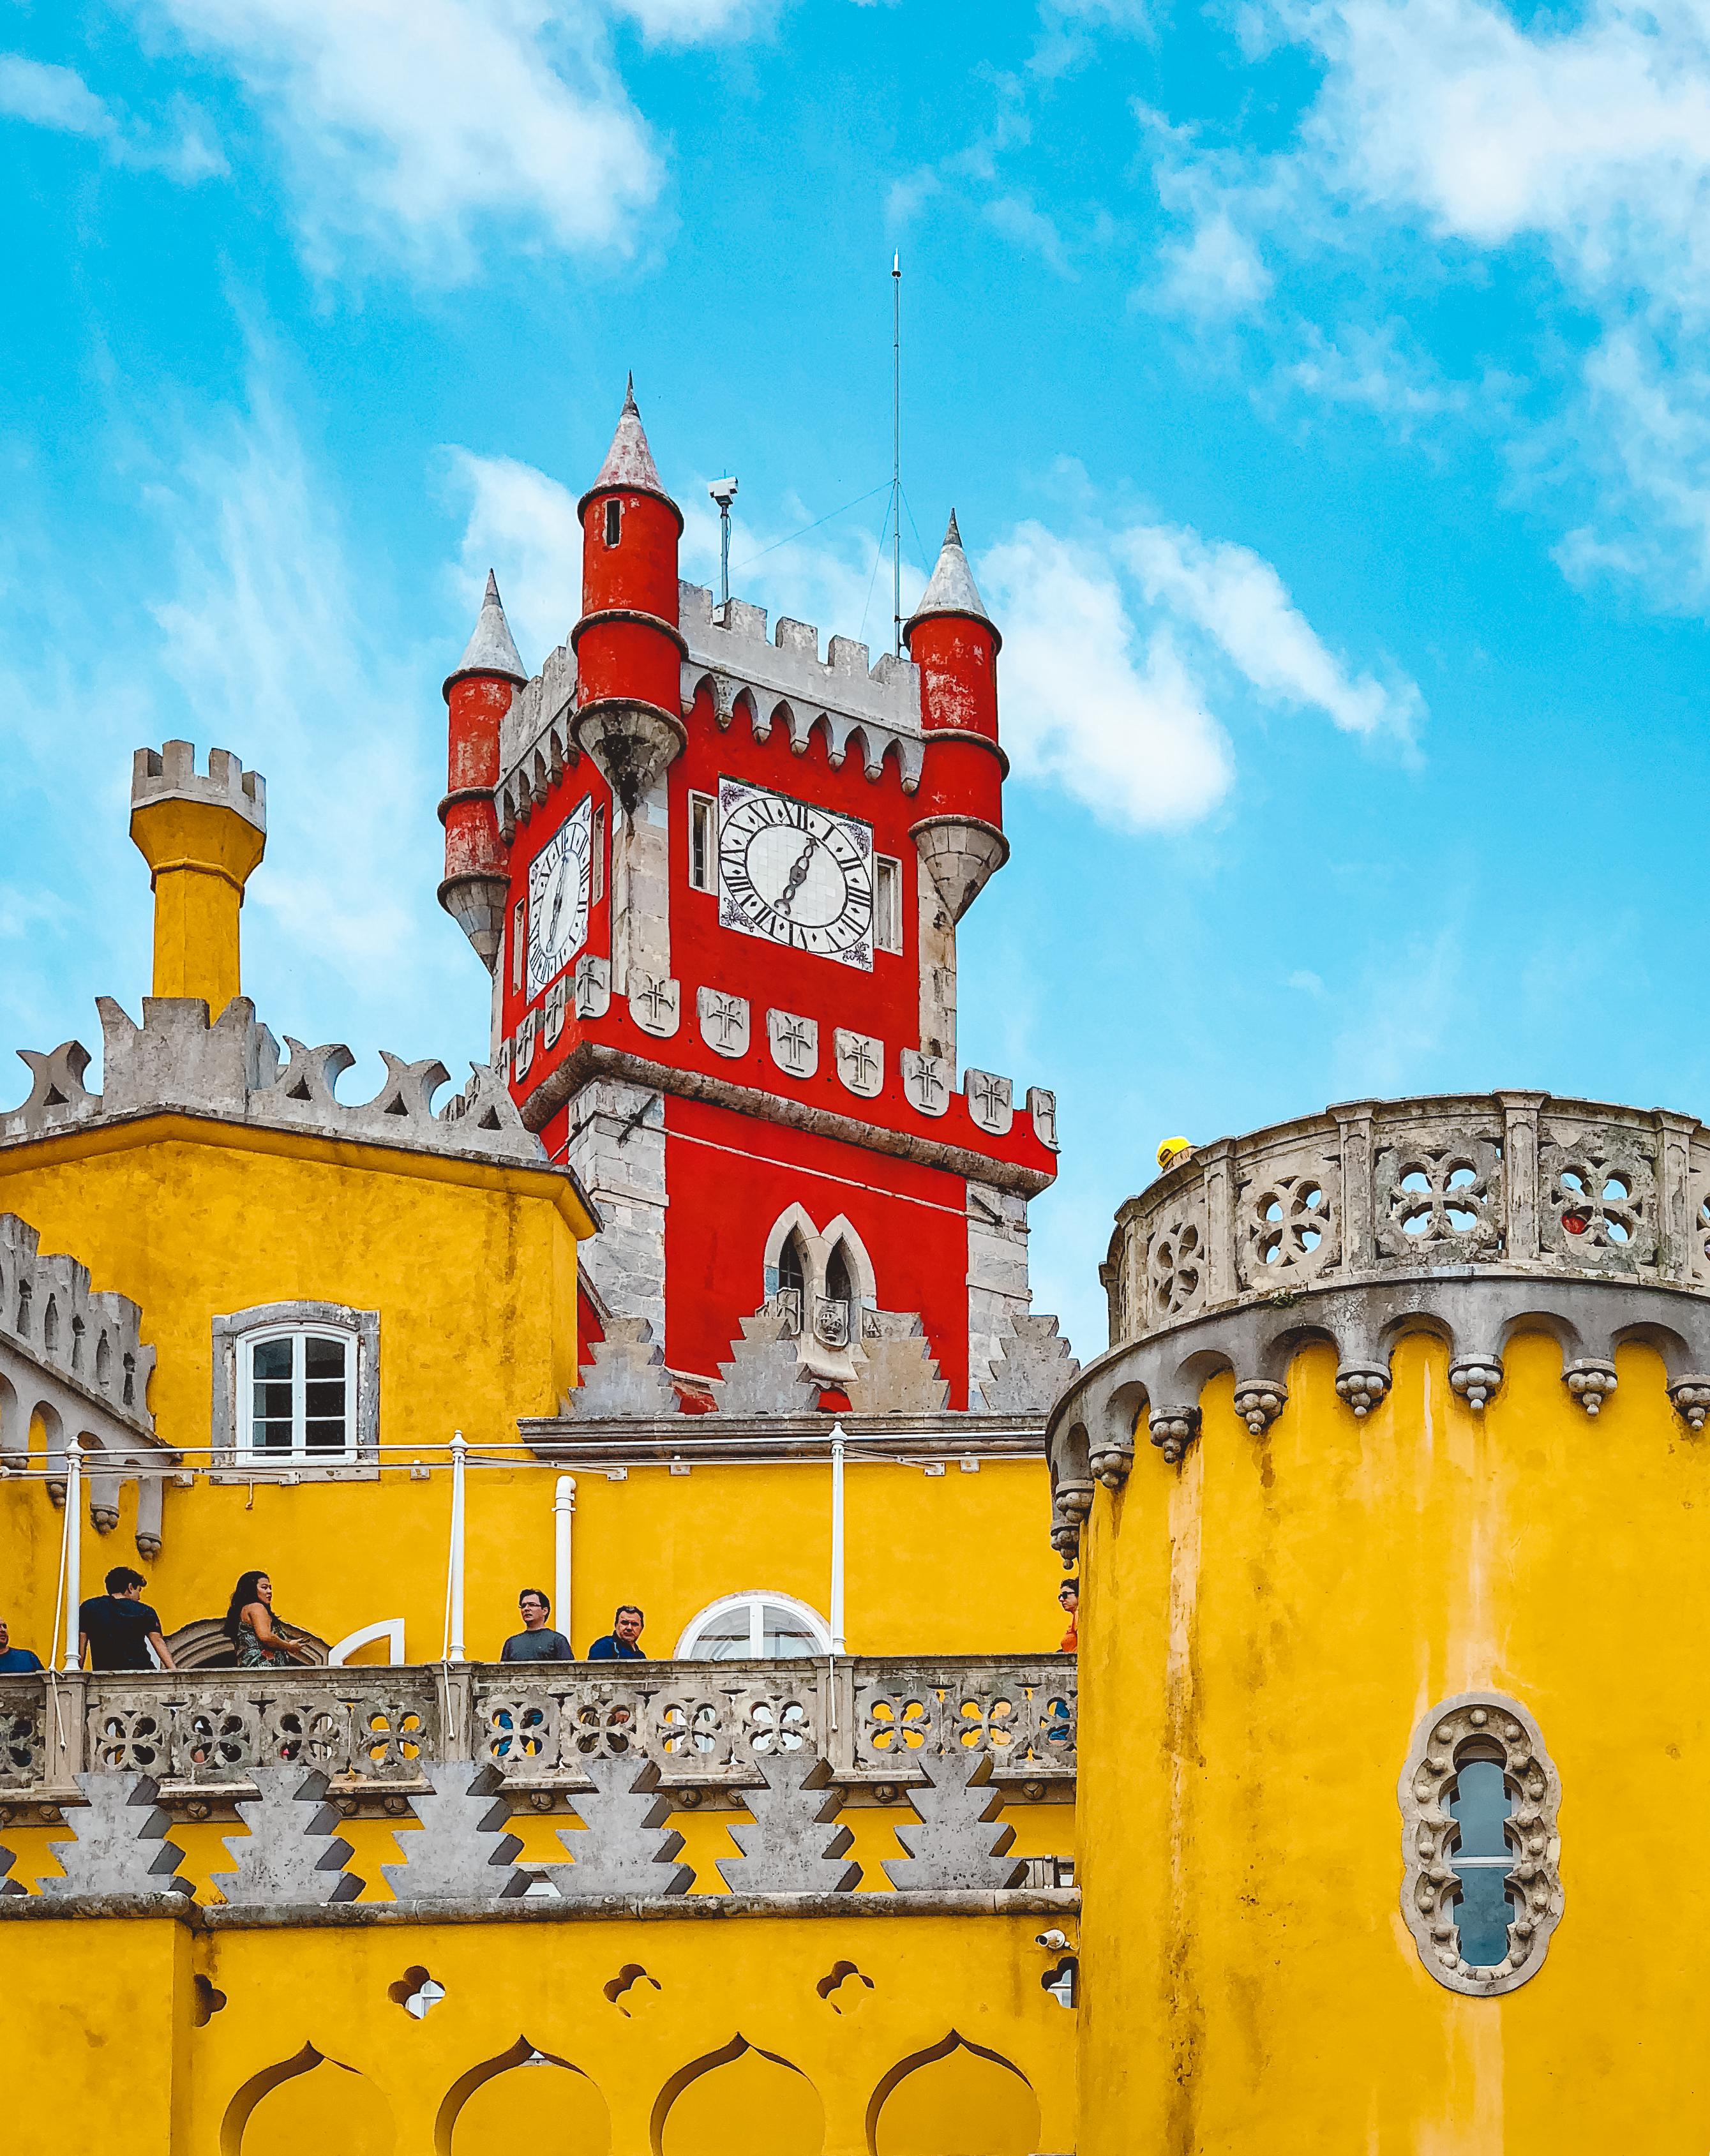 Muslim-travel-guide-Sintra-Portugal-Pena-Palace-clock-tower